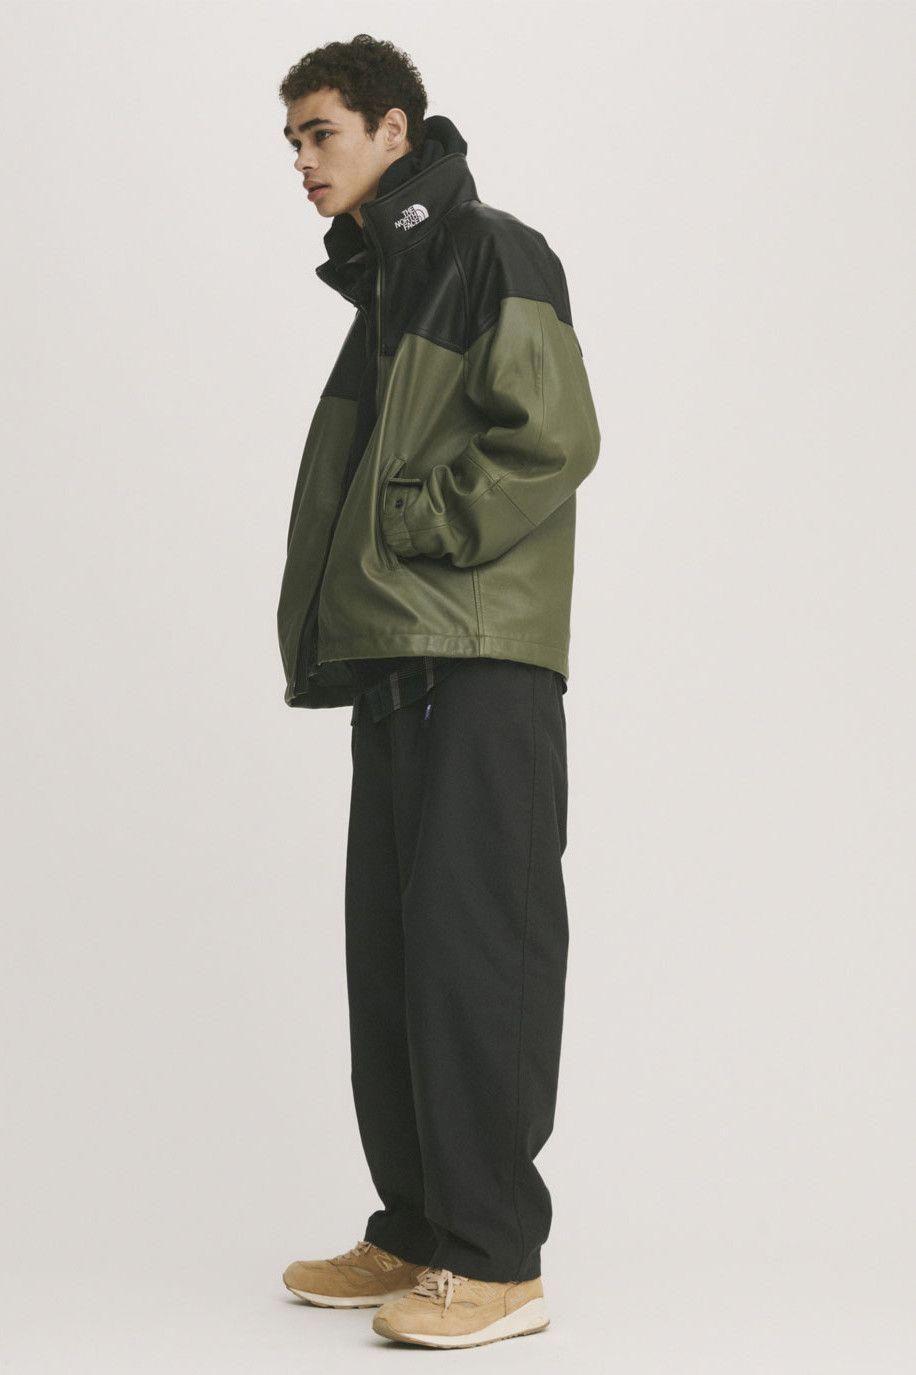 The North Face Purple Label Ss19 Lookbook Nanamica Eiichiro Homma Jackets Shirts Hats Hoodies Mensfashion North Face Jacket Mens Winter Fashion The North Face [ 1375 x 916 Pixel ]